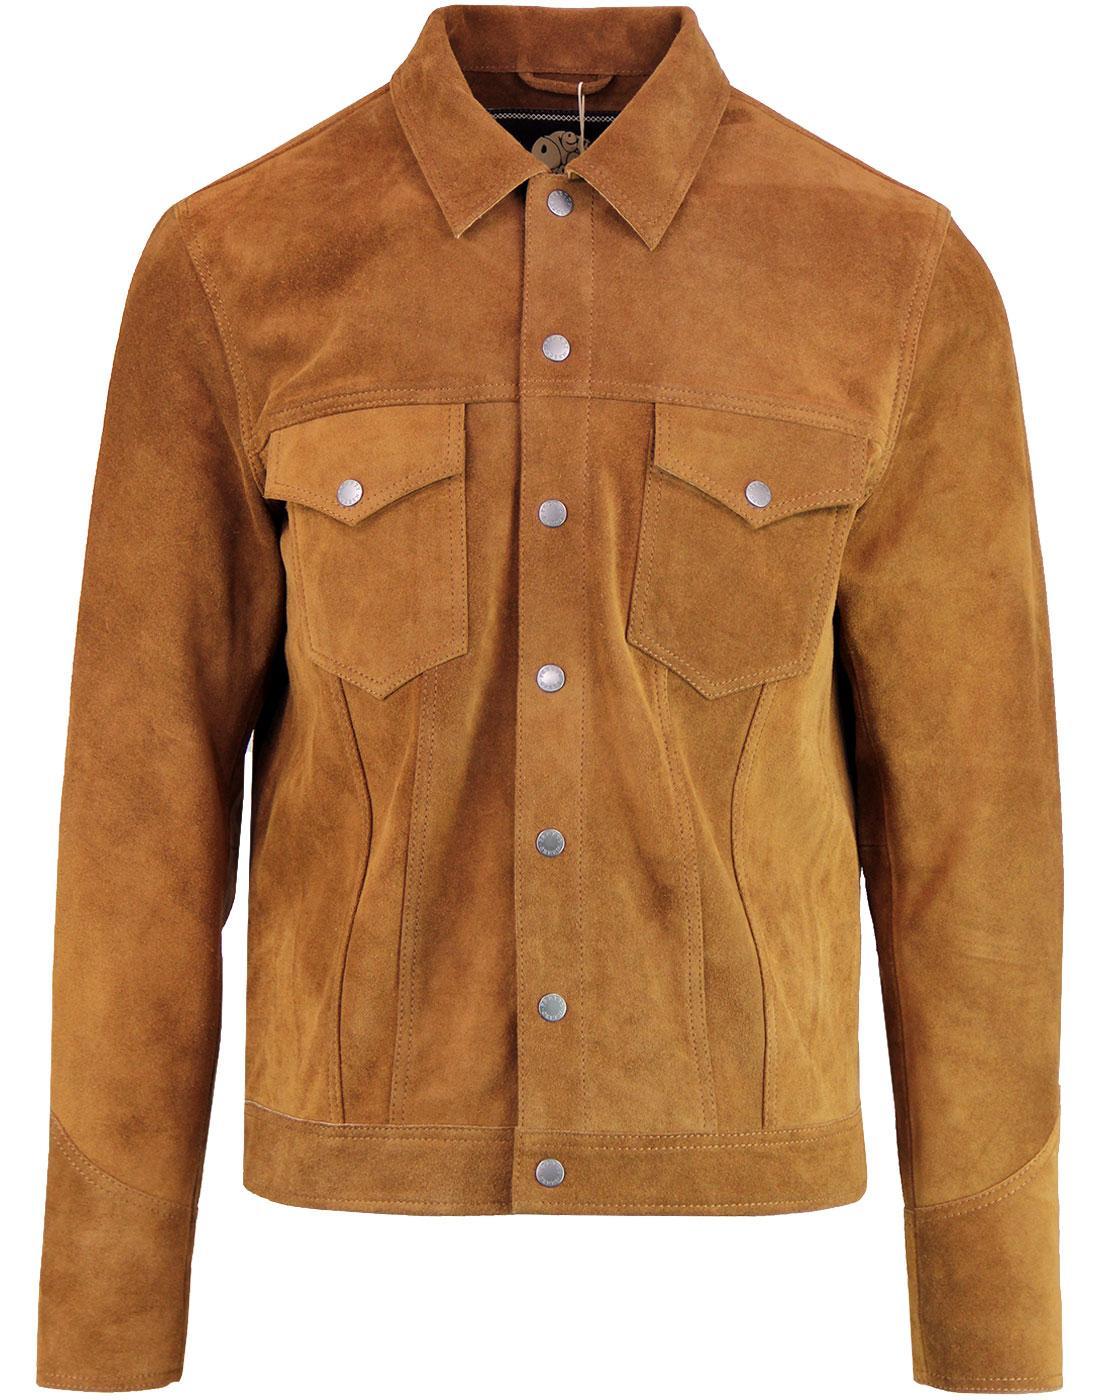 PRETTY GREEN Retro 70's Western Suede Jacket